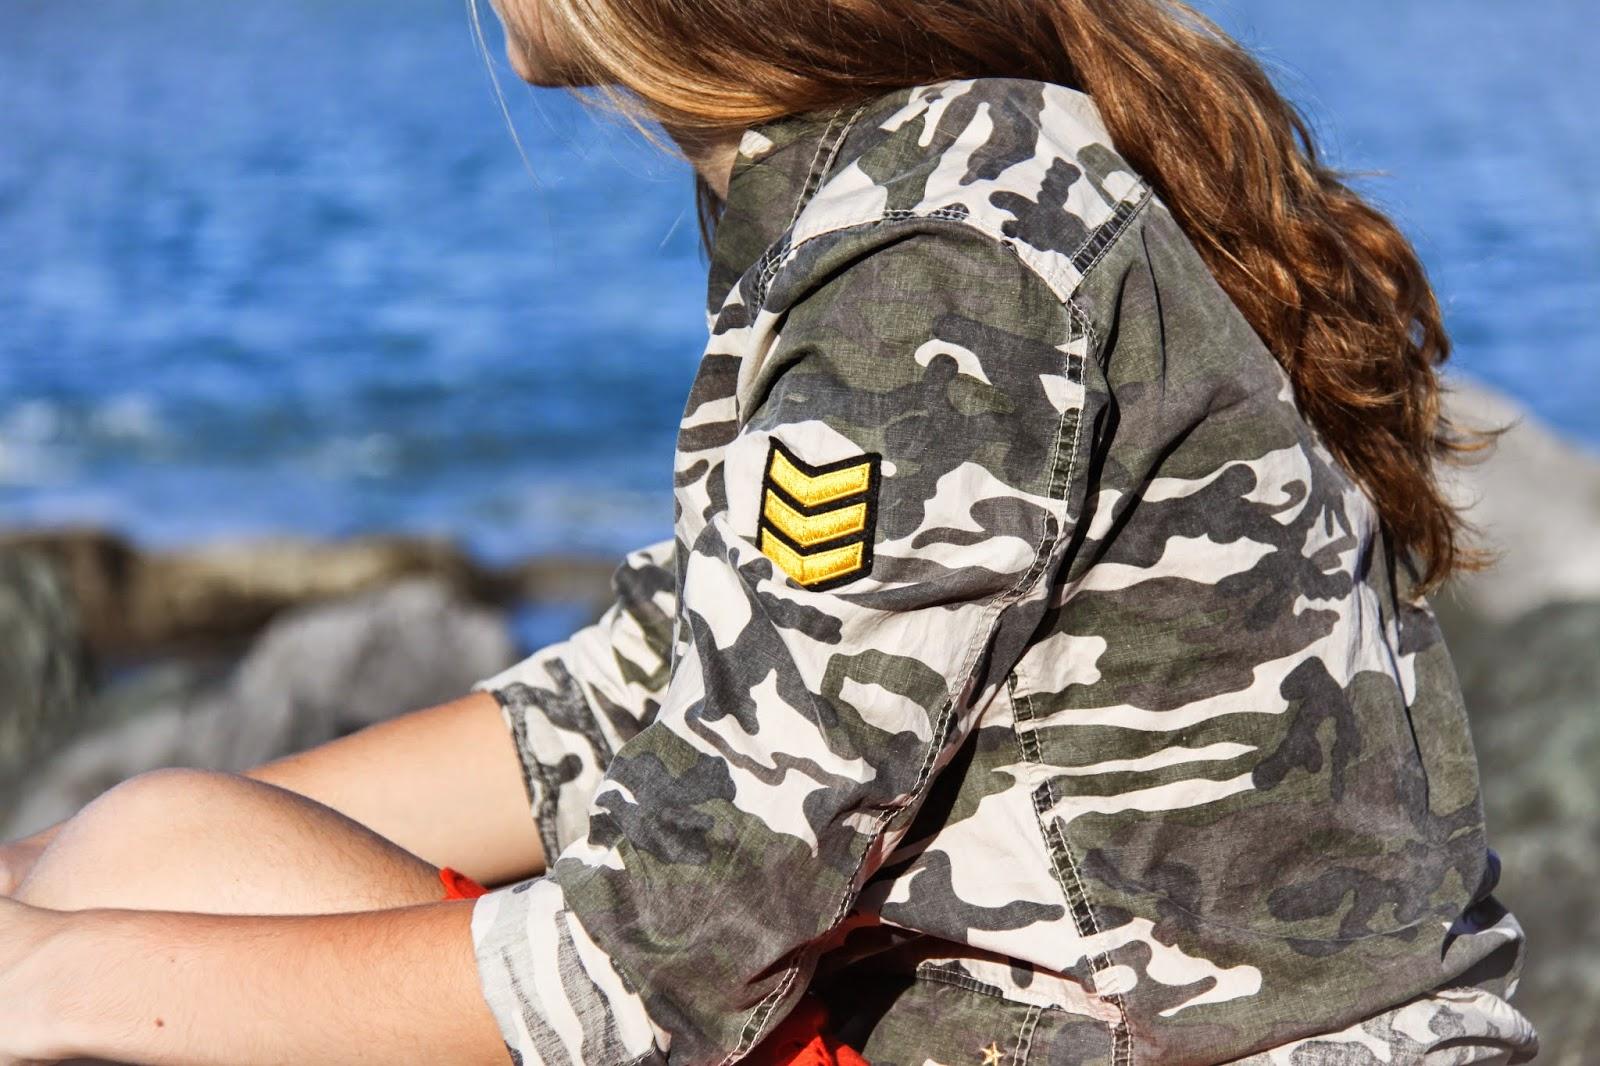 bteam by bensimon,bensimon, bensimon hossegor, army,camouflage,surplus,broderie anglaise,guéthary